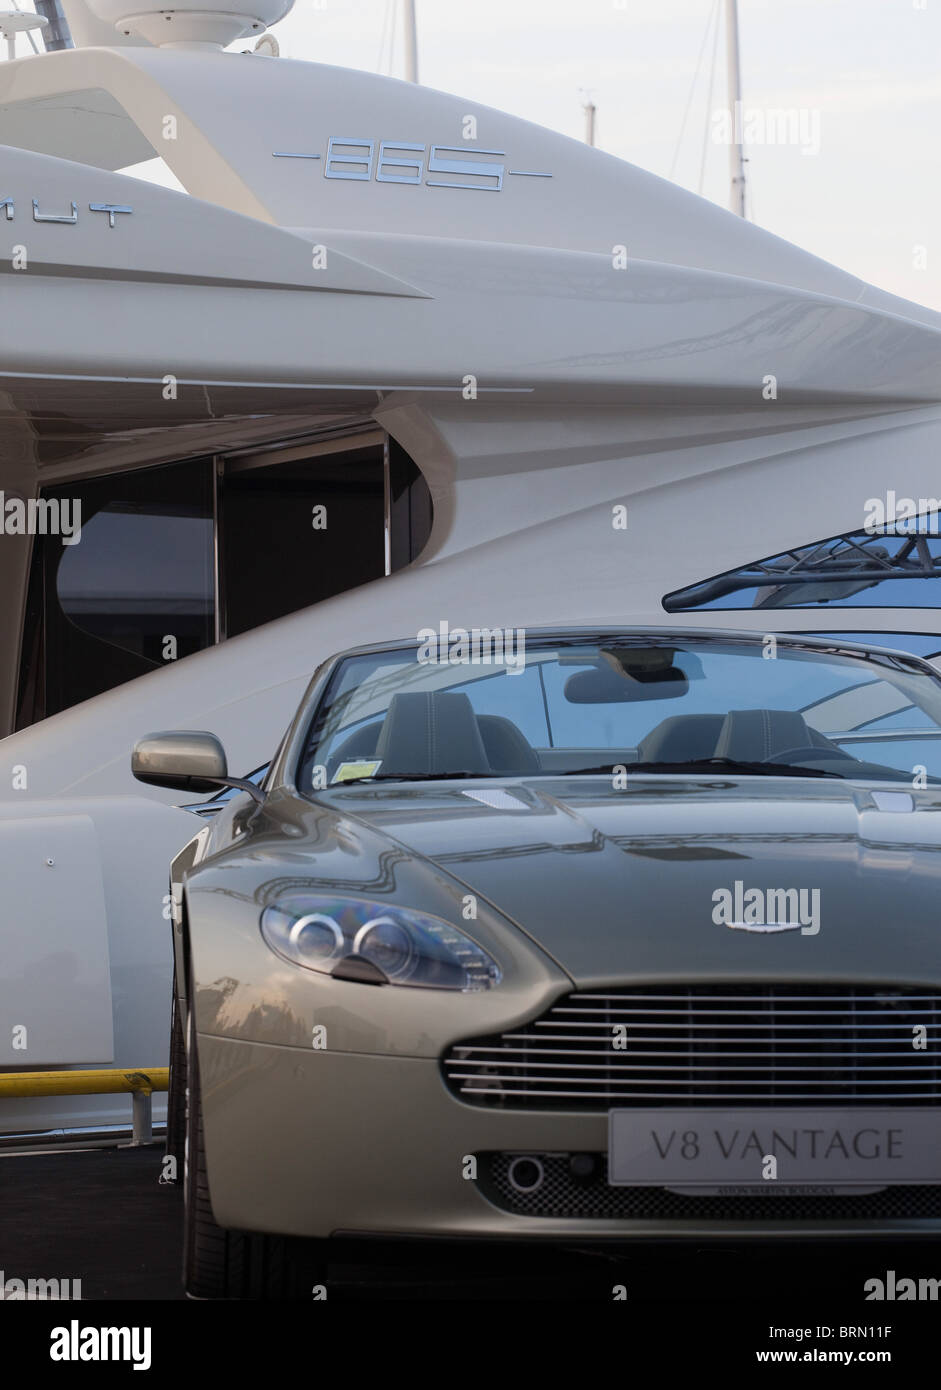 Aston Martin Luxury Car And Yacht Exibition Stock Photo 31809275